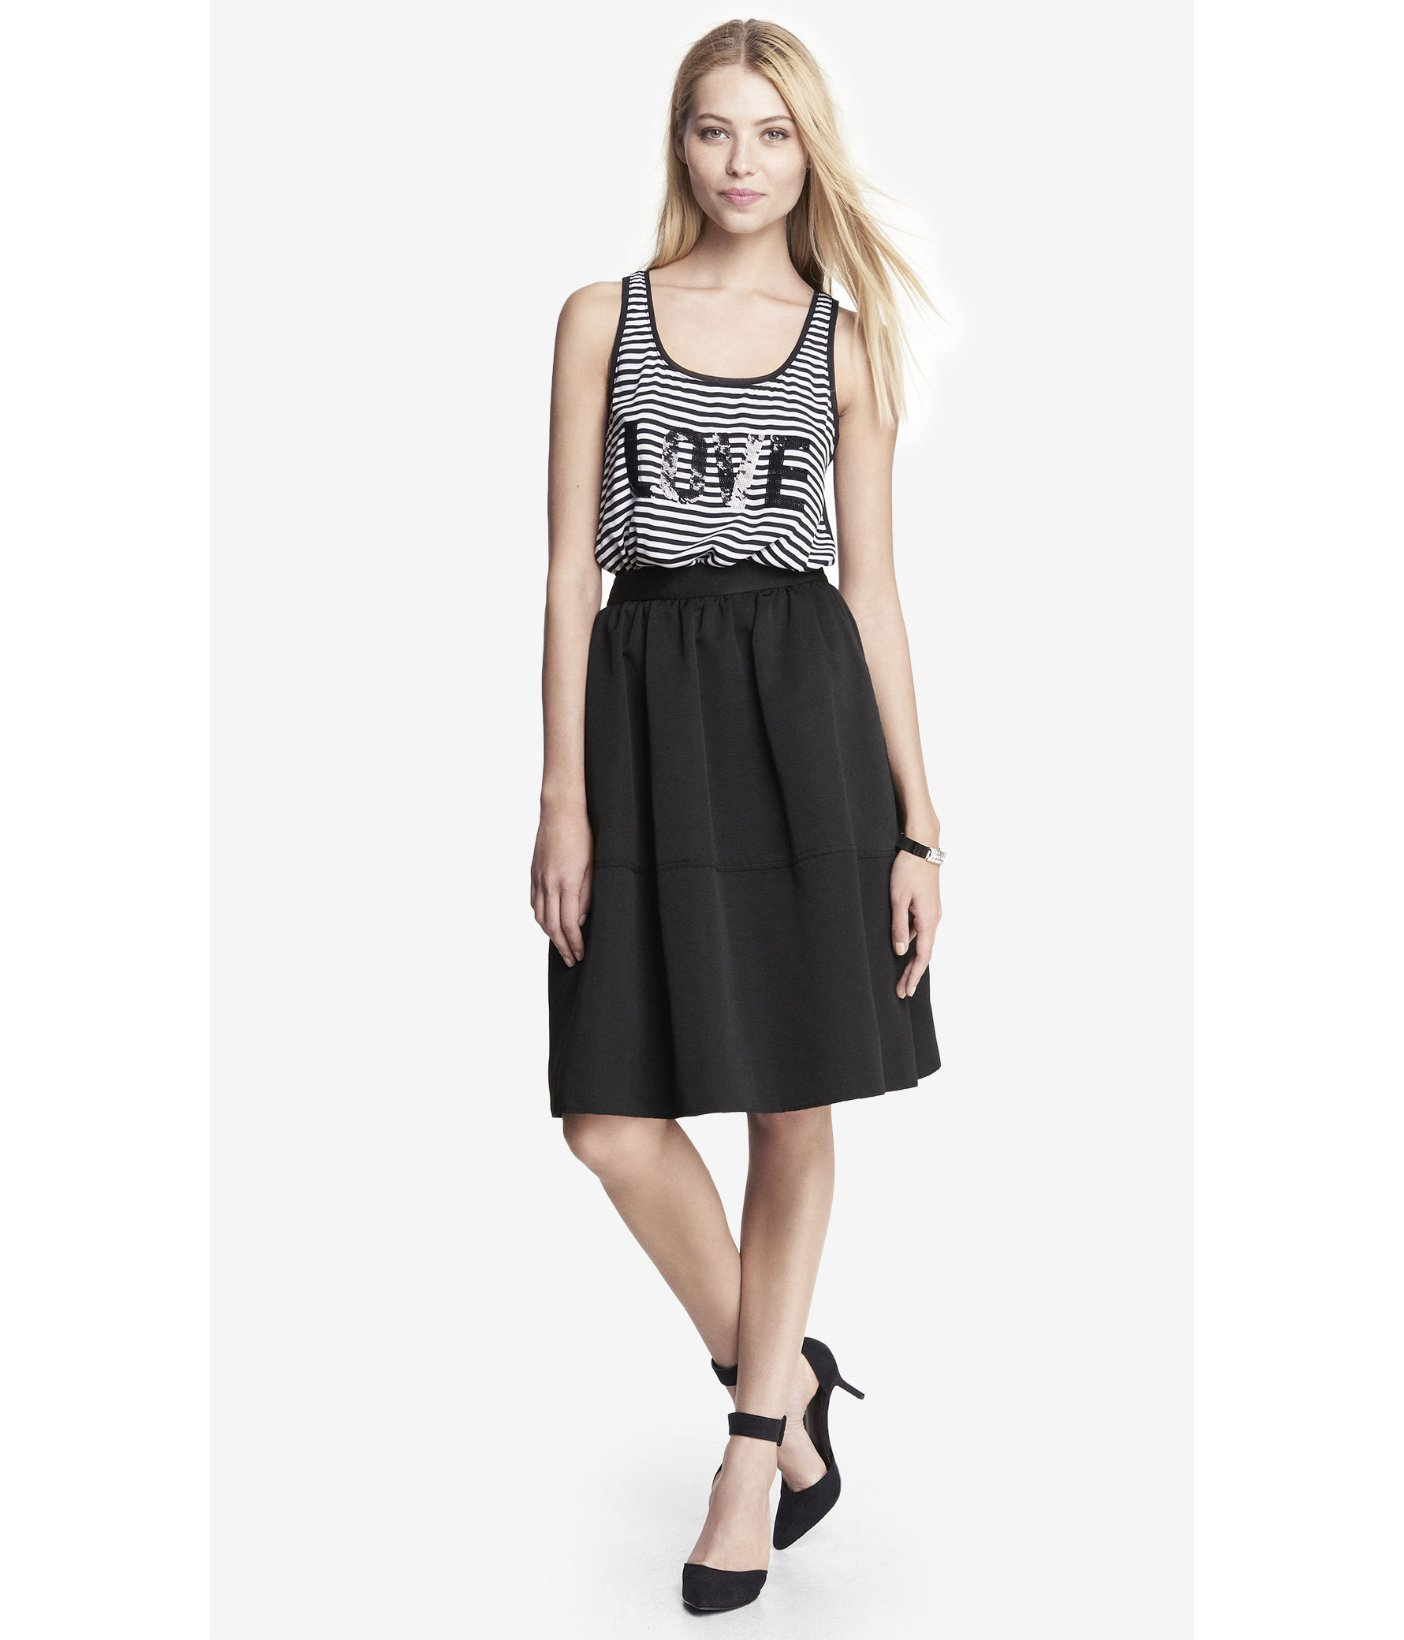 express high waist midi skirt in black pitch black